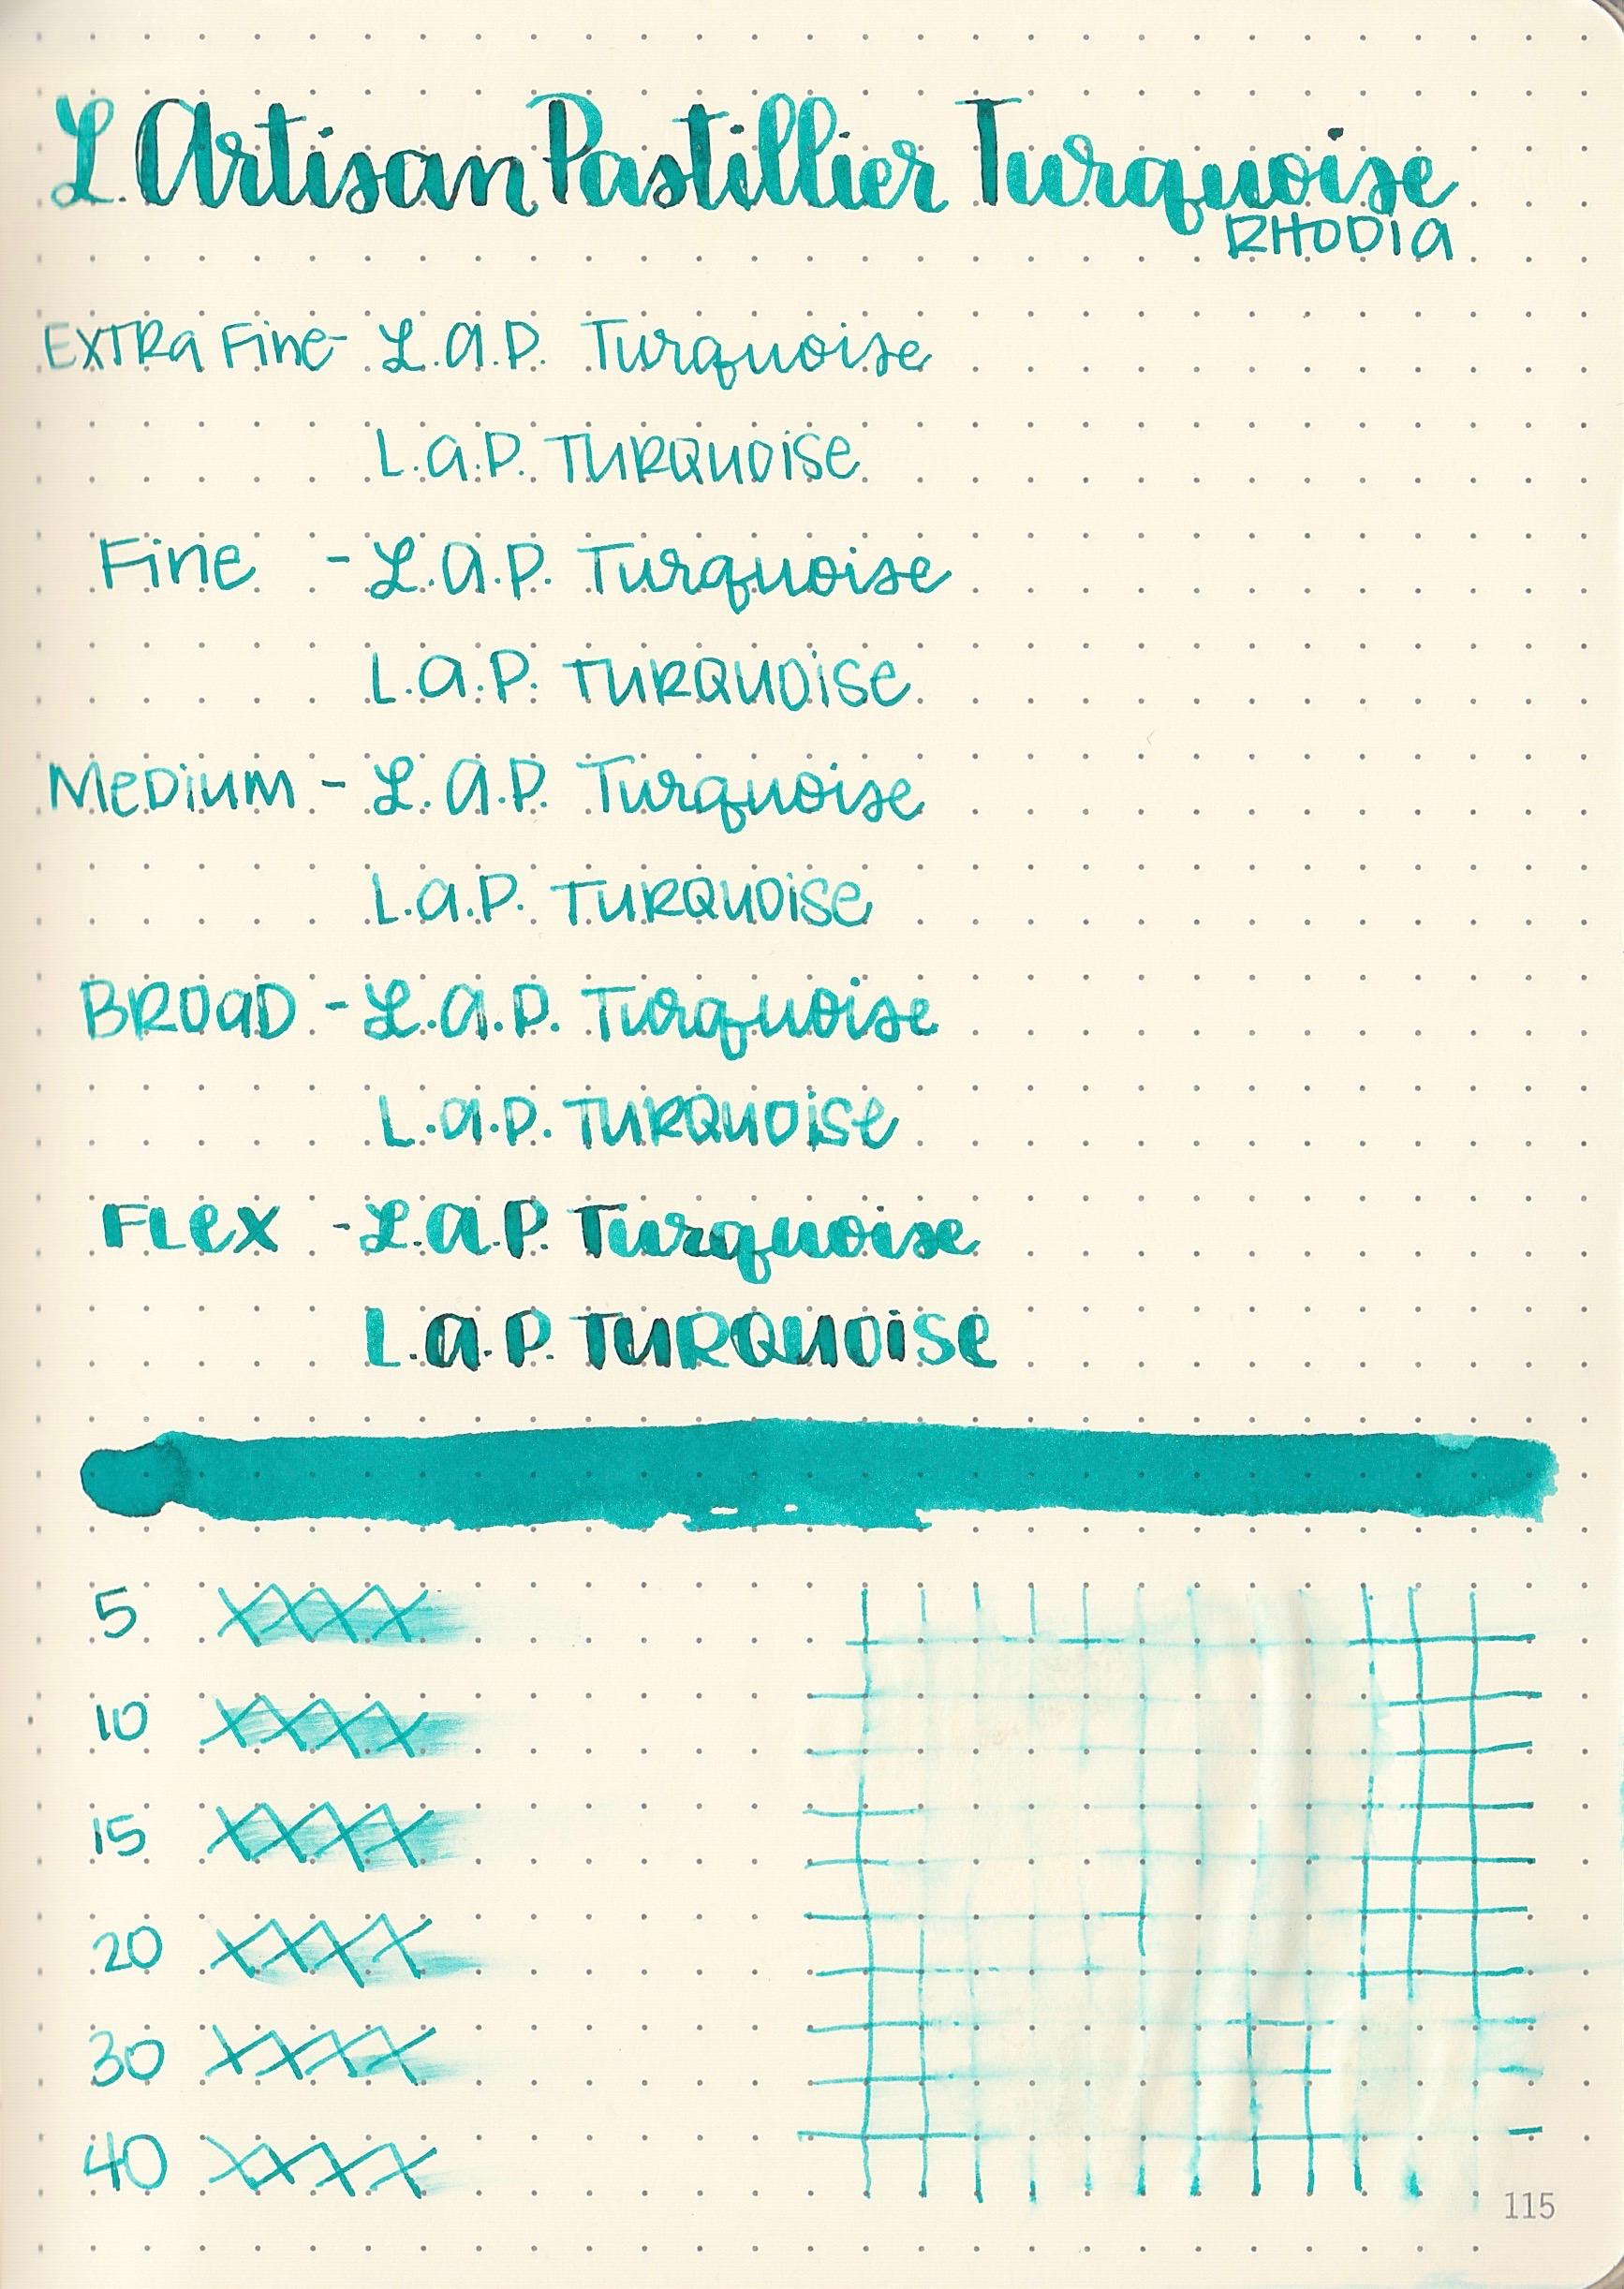 LAPTurquoise - 13.jpg